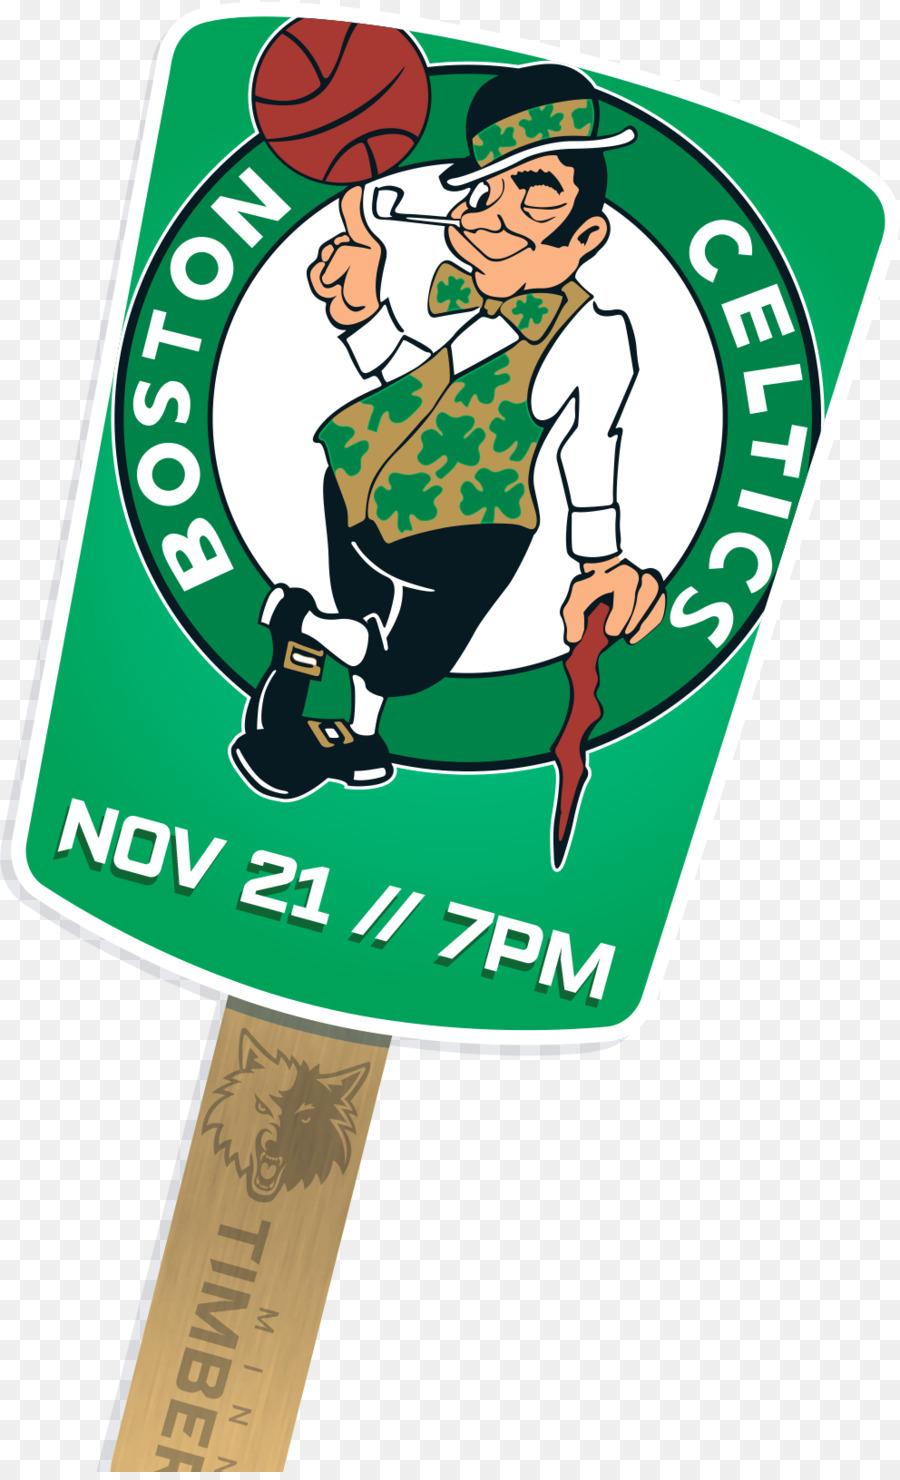 Boston Celtics Cleveland Cavaliers 2018 NBA Playoffs de la NBA ...